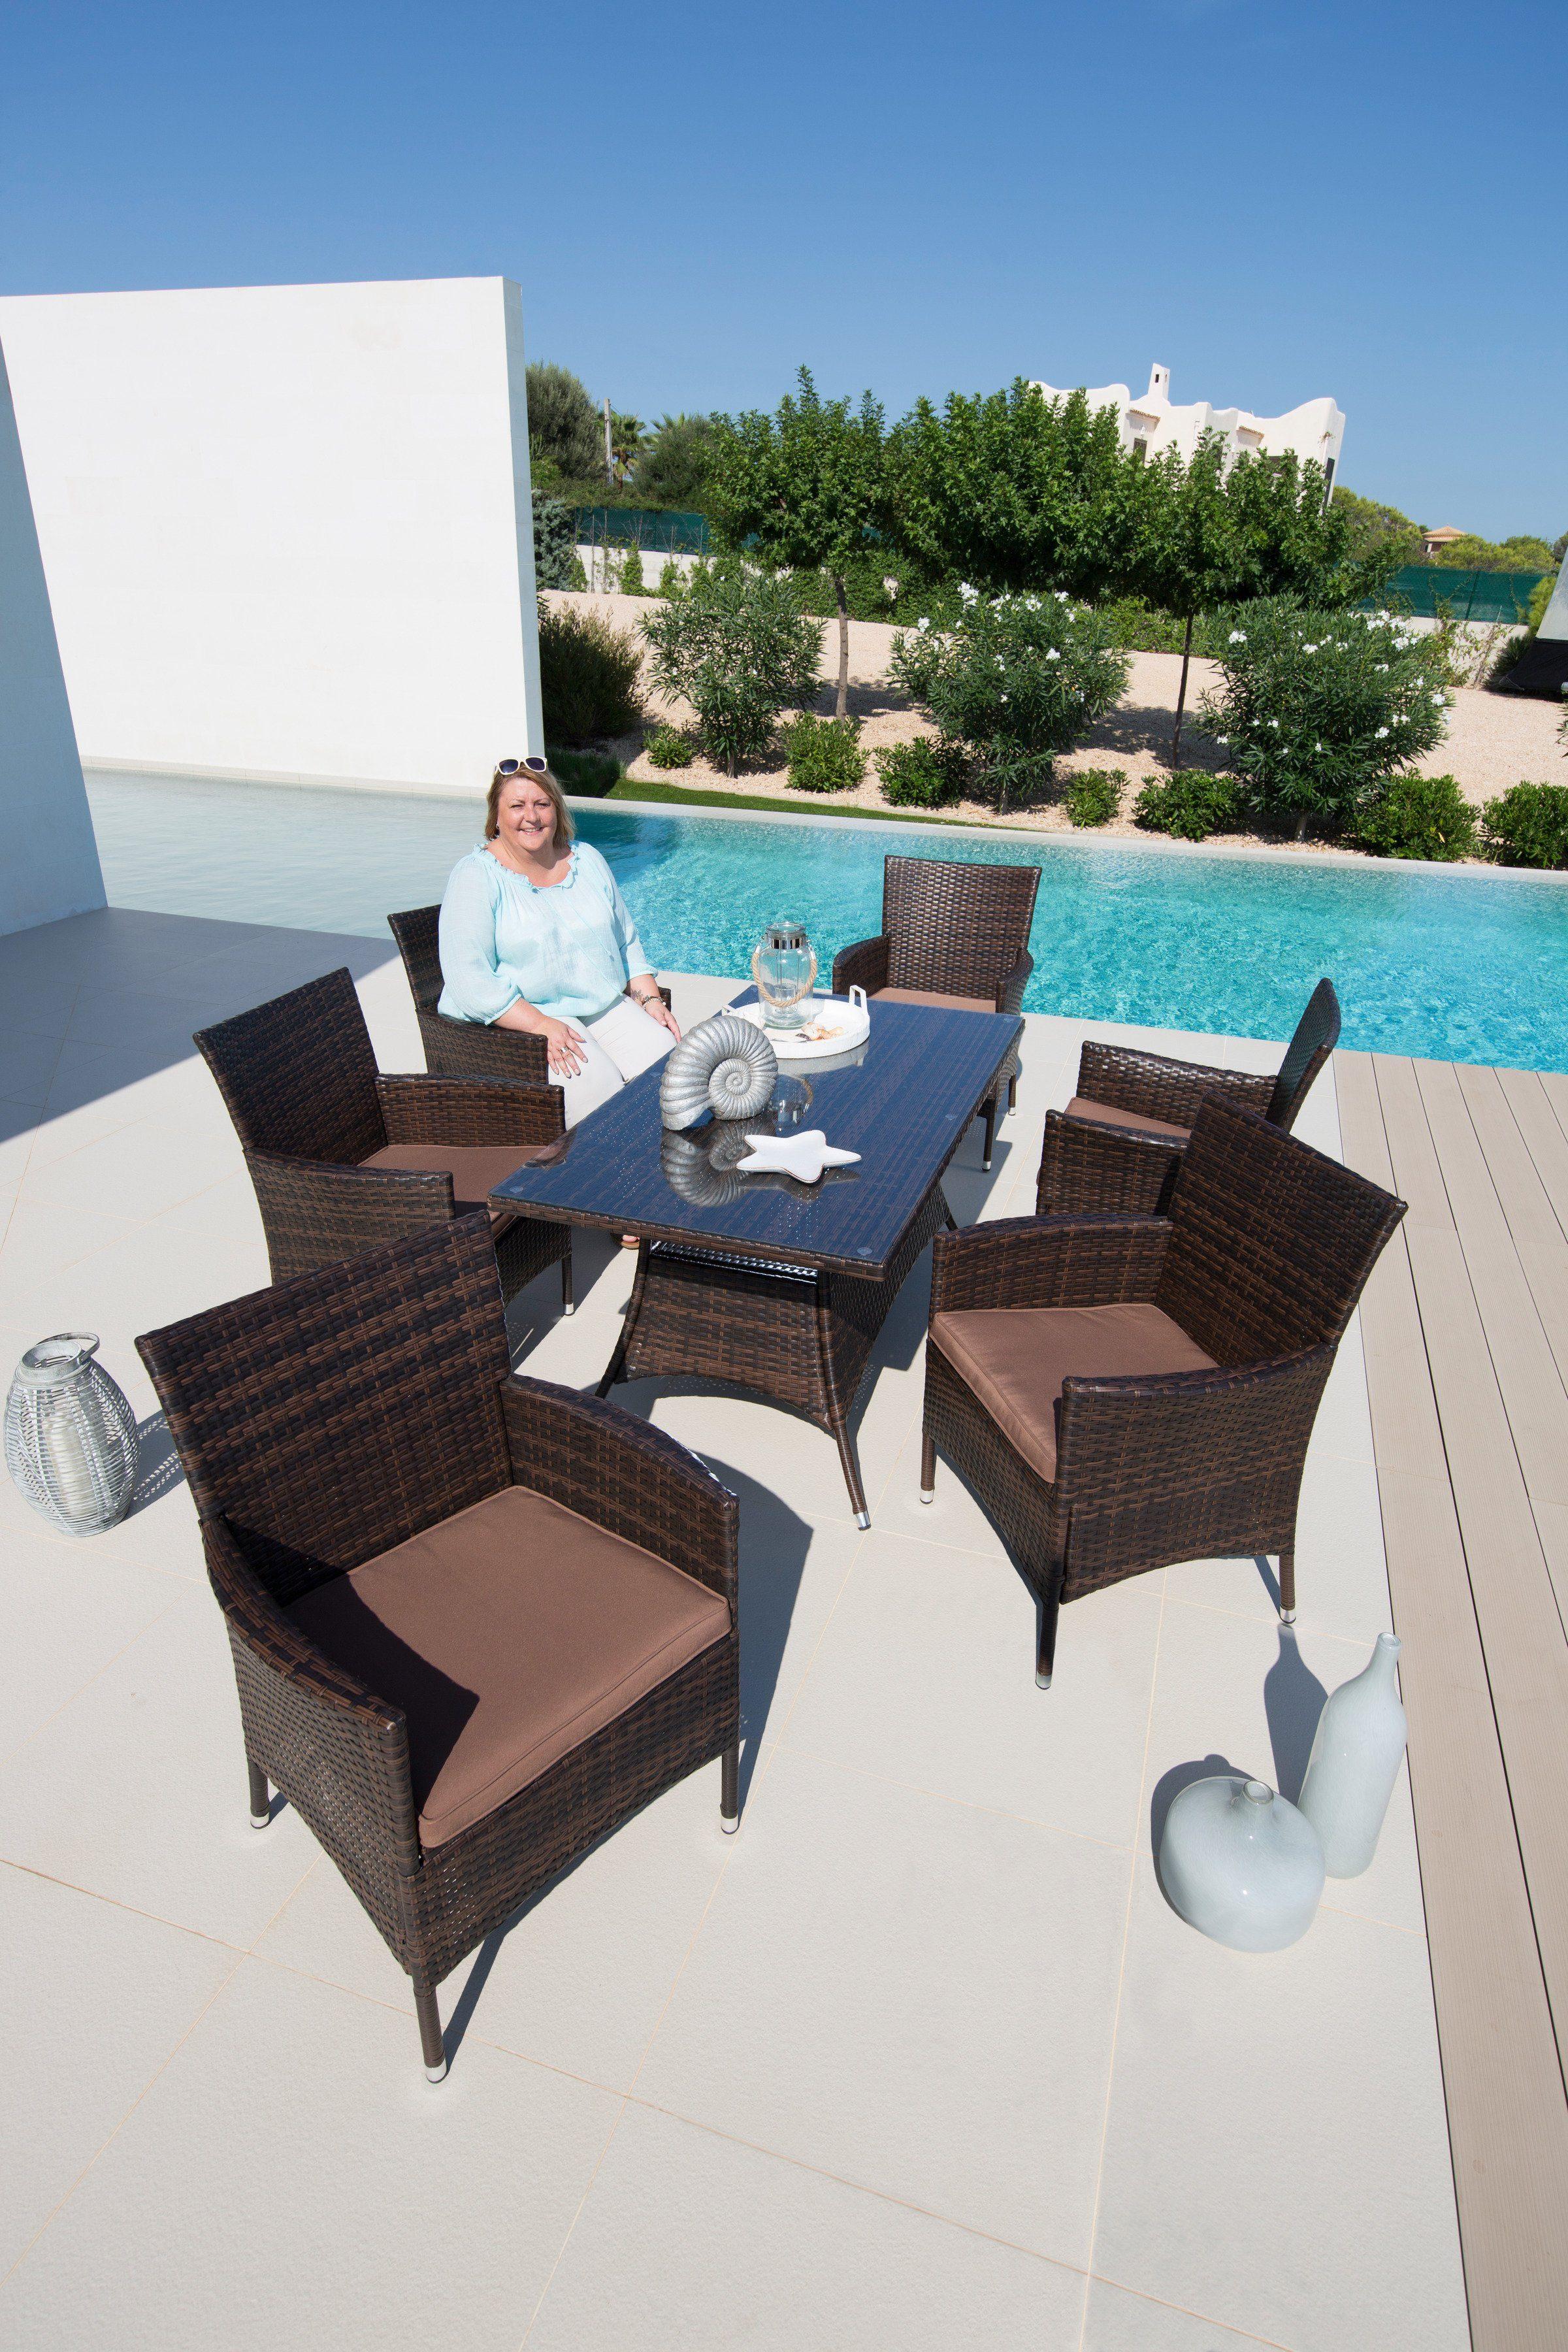 13.tgl. Gartenmöbelset »Santiago XL«, 6 Sessel, Tisch 150x80 cm, Polyrattan, braun